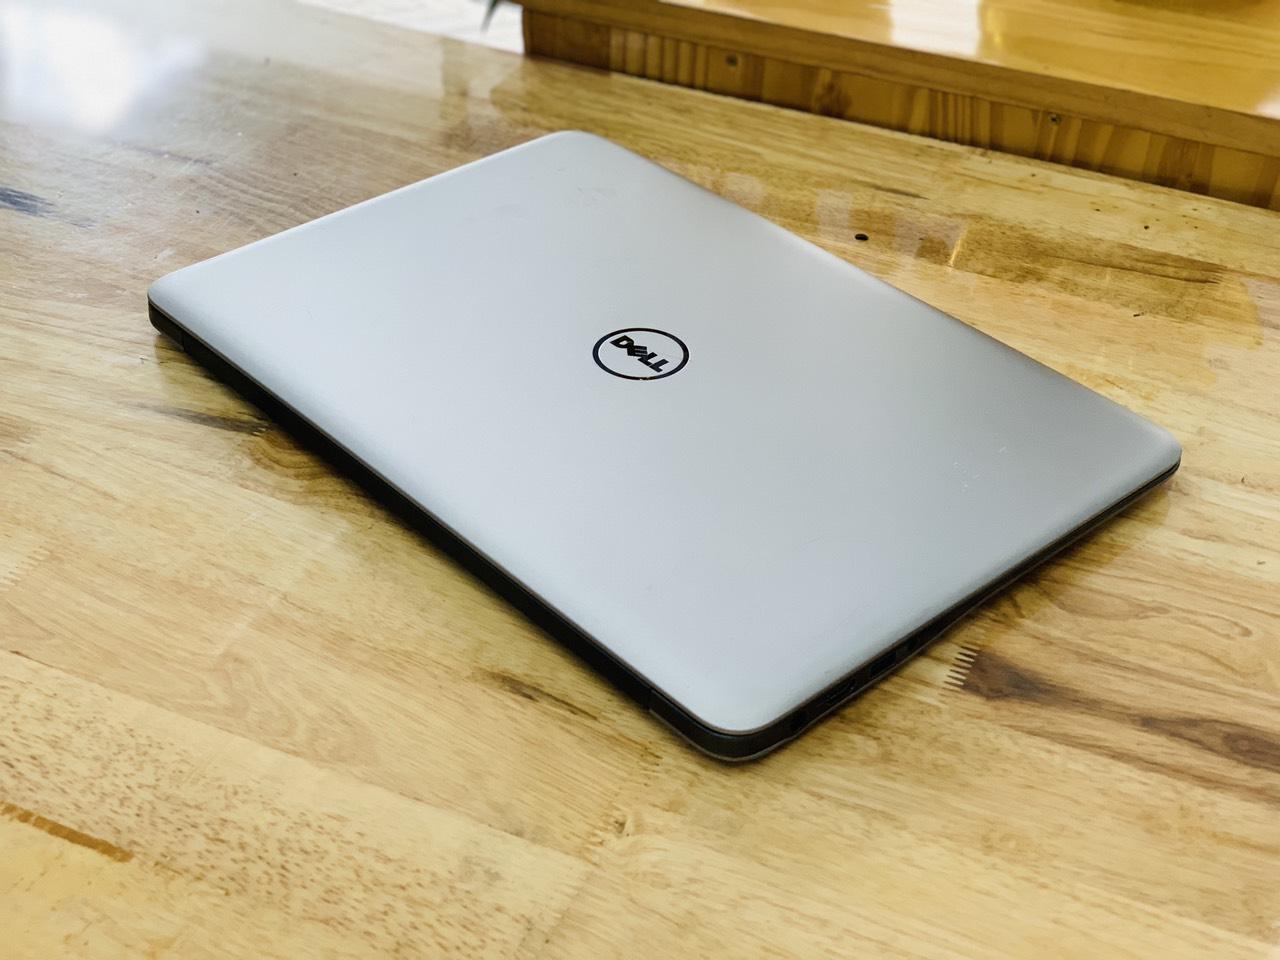 Dell inspiron 7548 i7